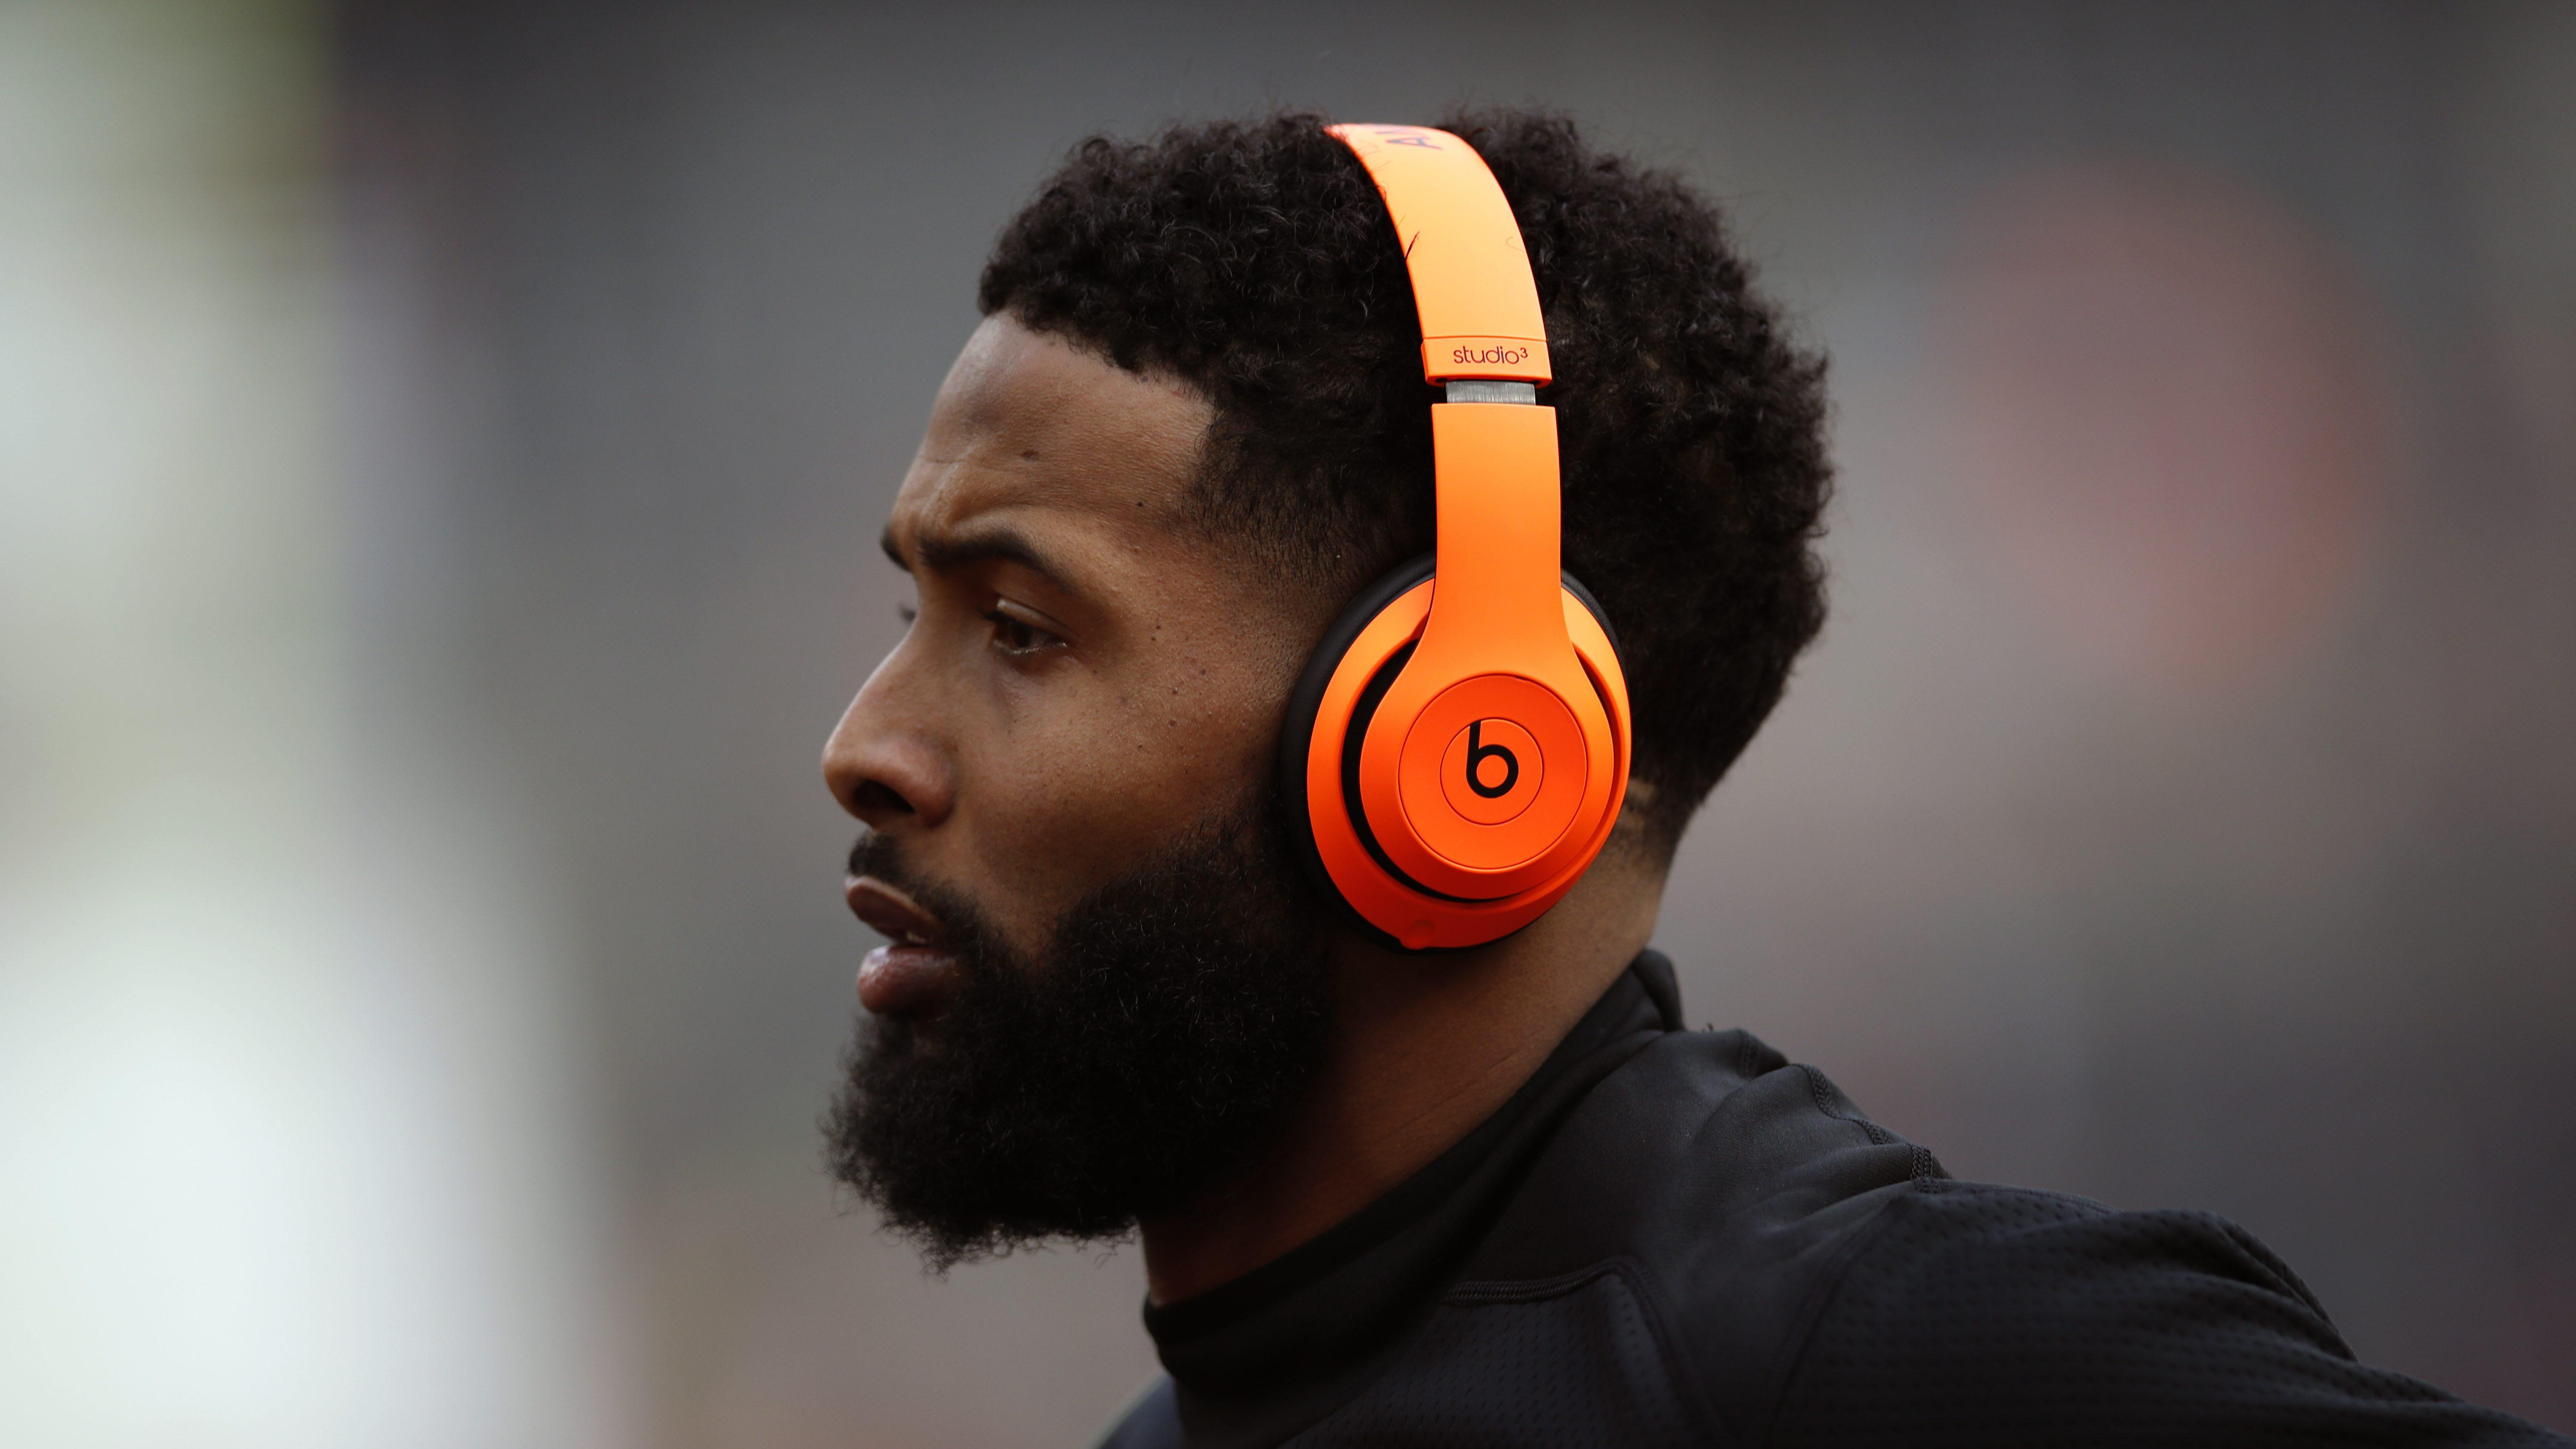 A football player wearing headphones